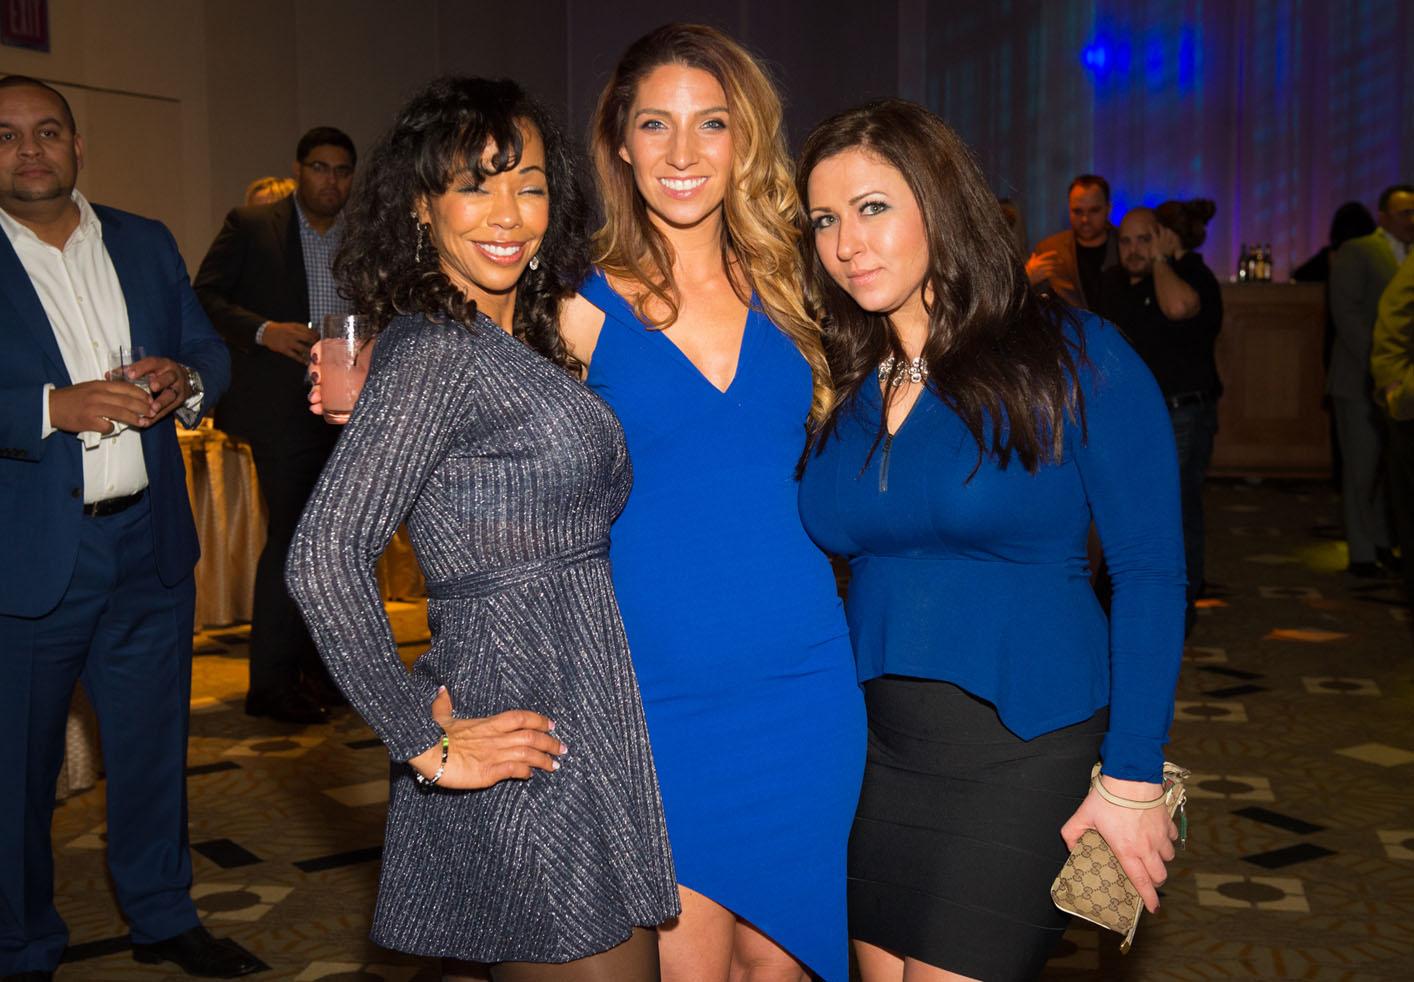 2015-12-09 ReMax Corpoarte Event - The Borgata - Atlantic City NJ - Photo Sesh - 2015-5372.jpg